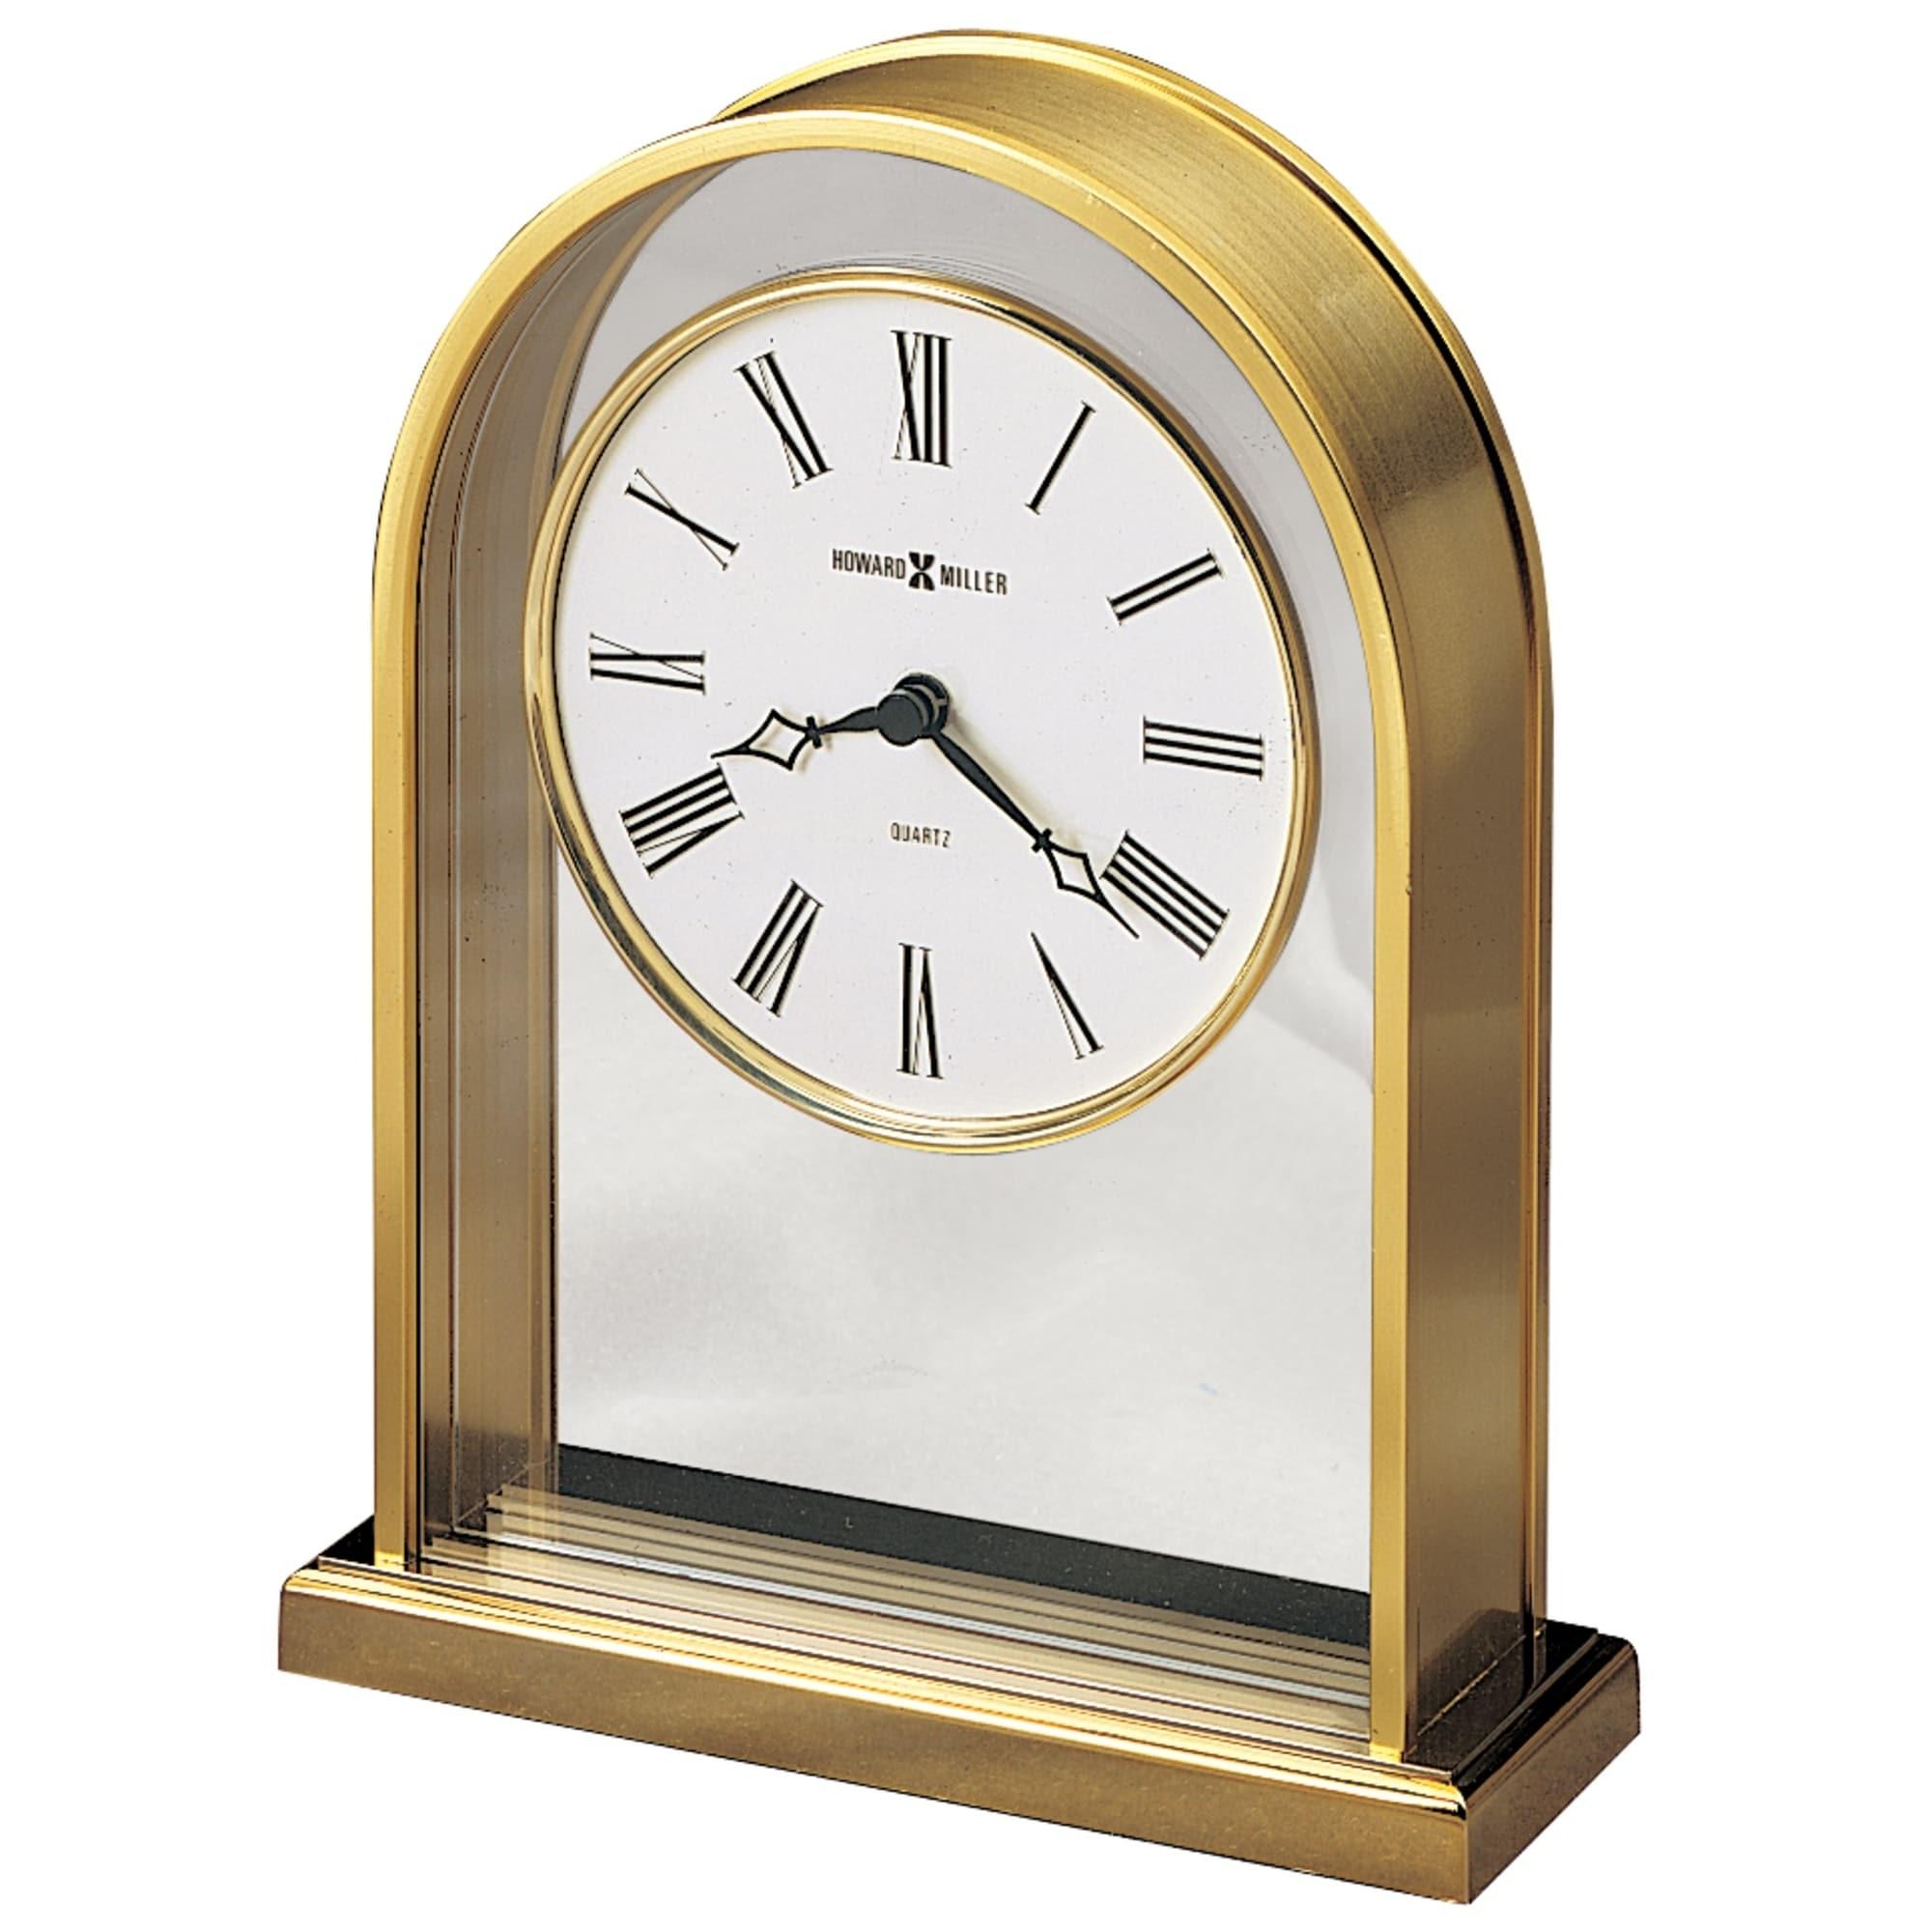 Howard Miller Reminisce Contemporary Transitional Clic And Glam Style Mantel Clock Reloj Del Estante